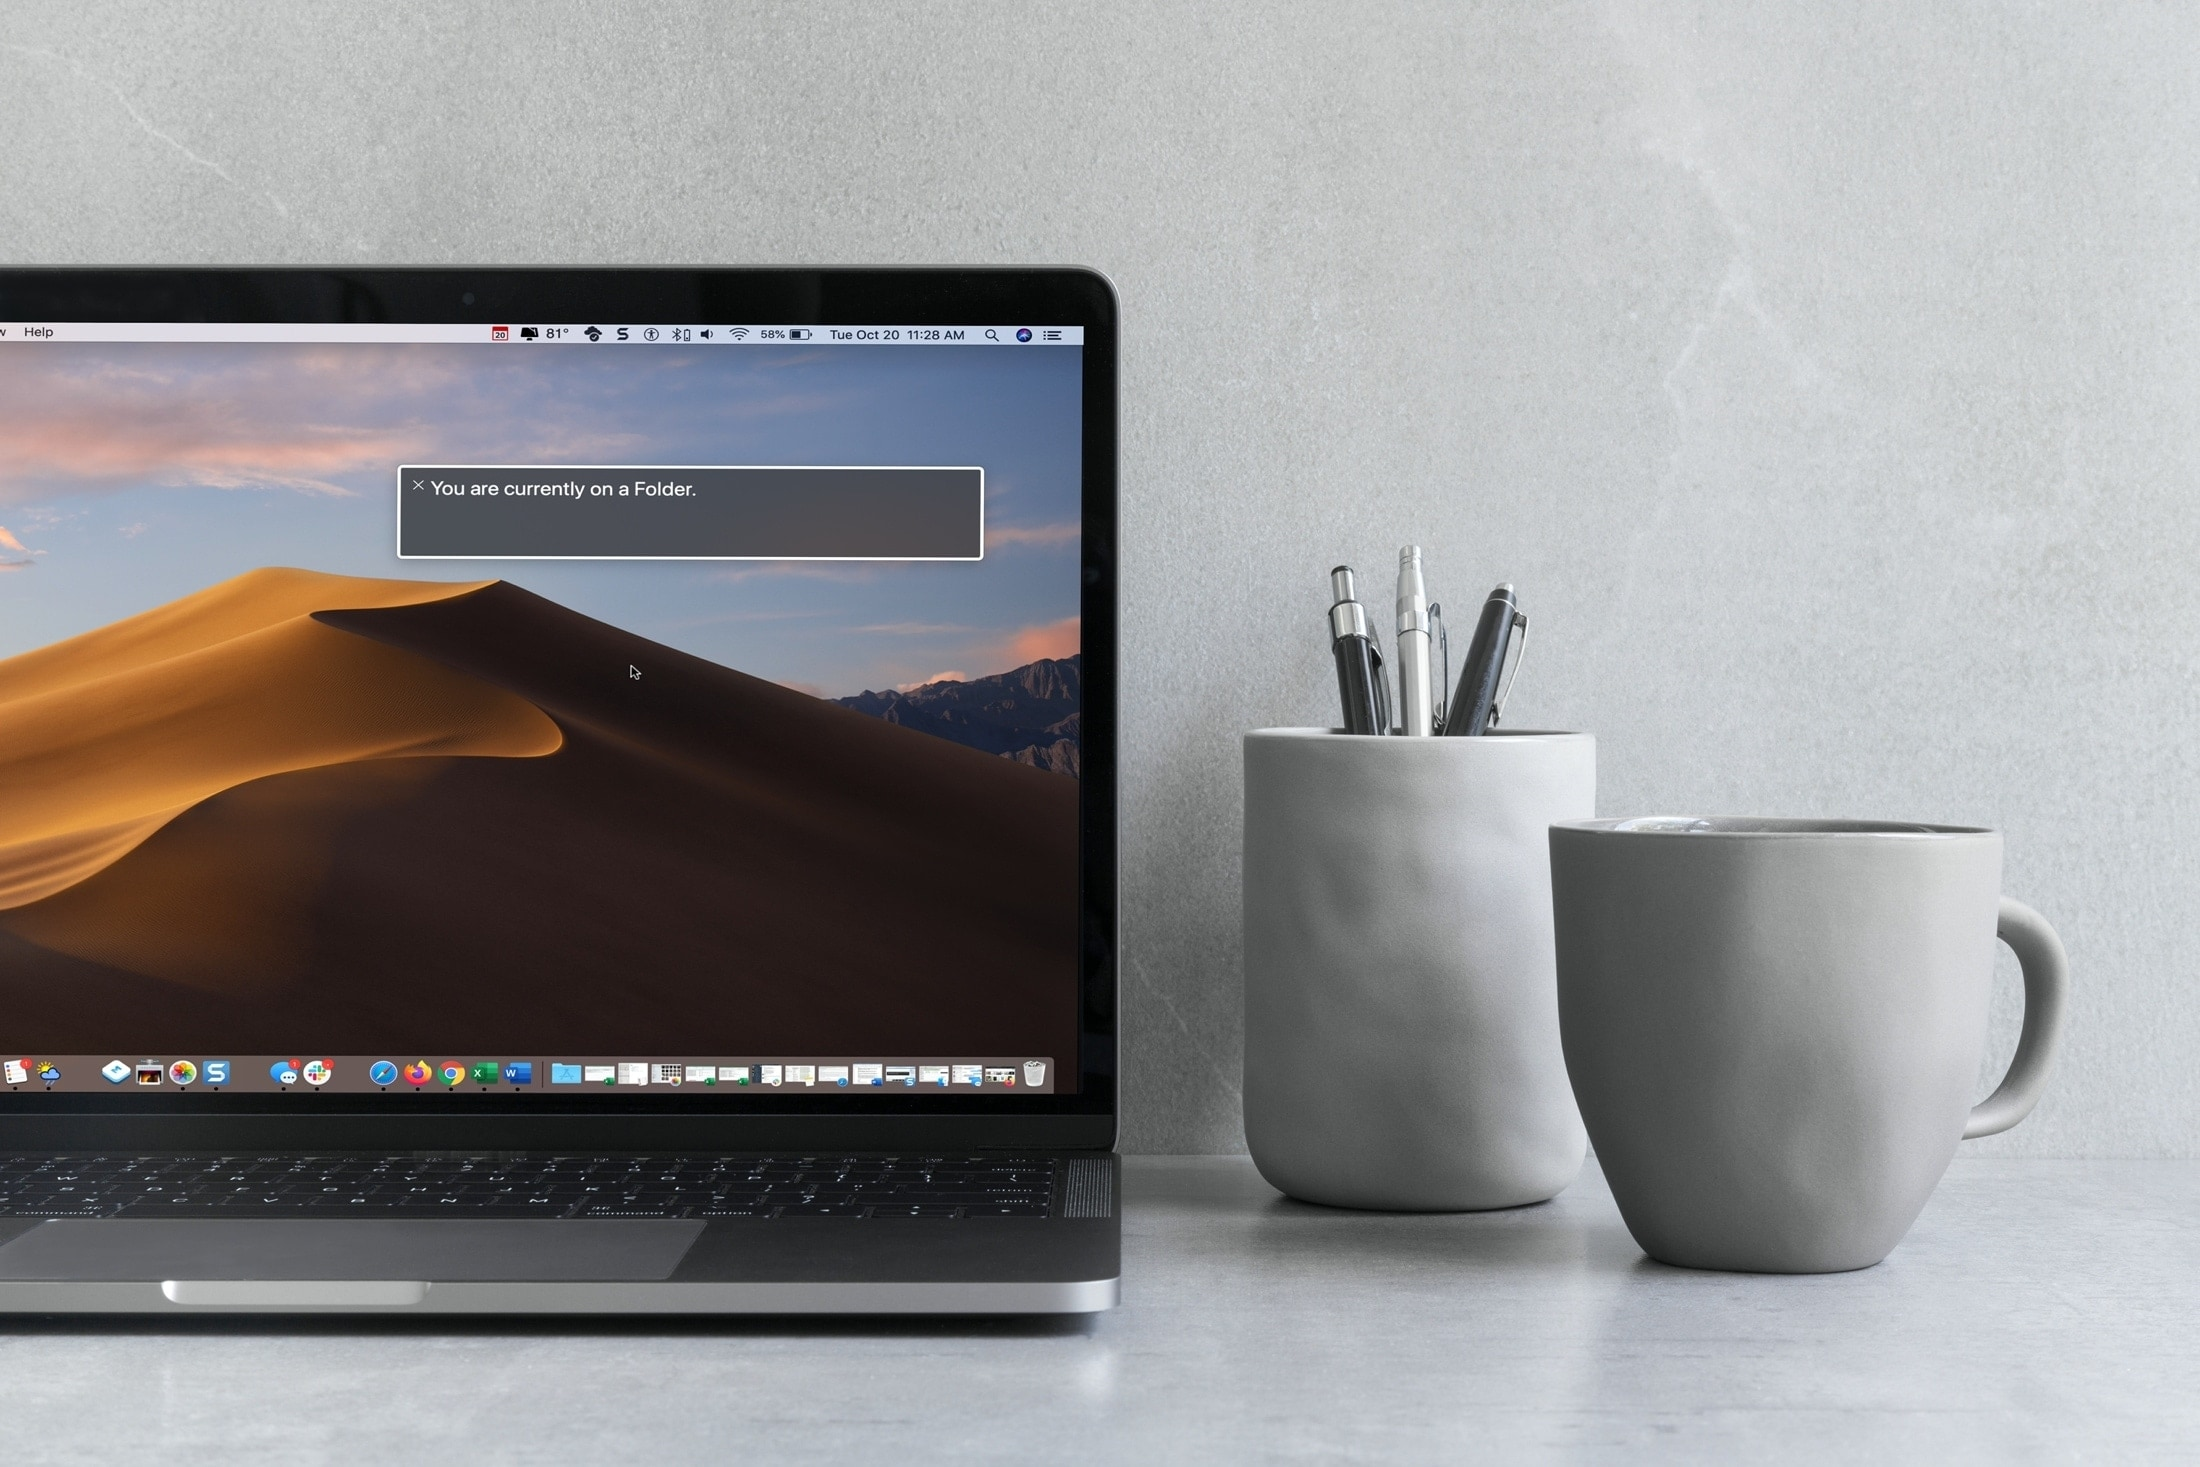 Voiceover prompt window on macbook pro